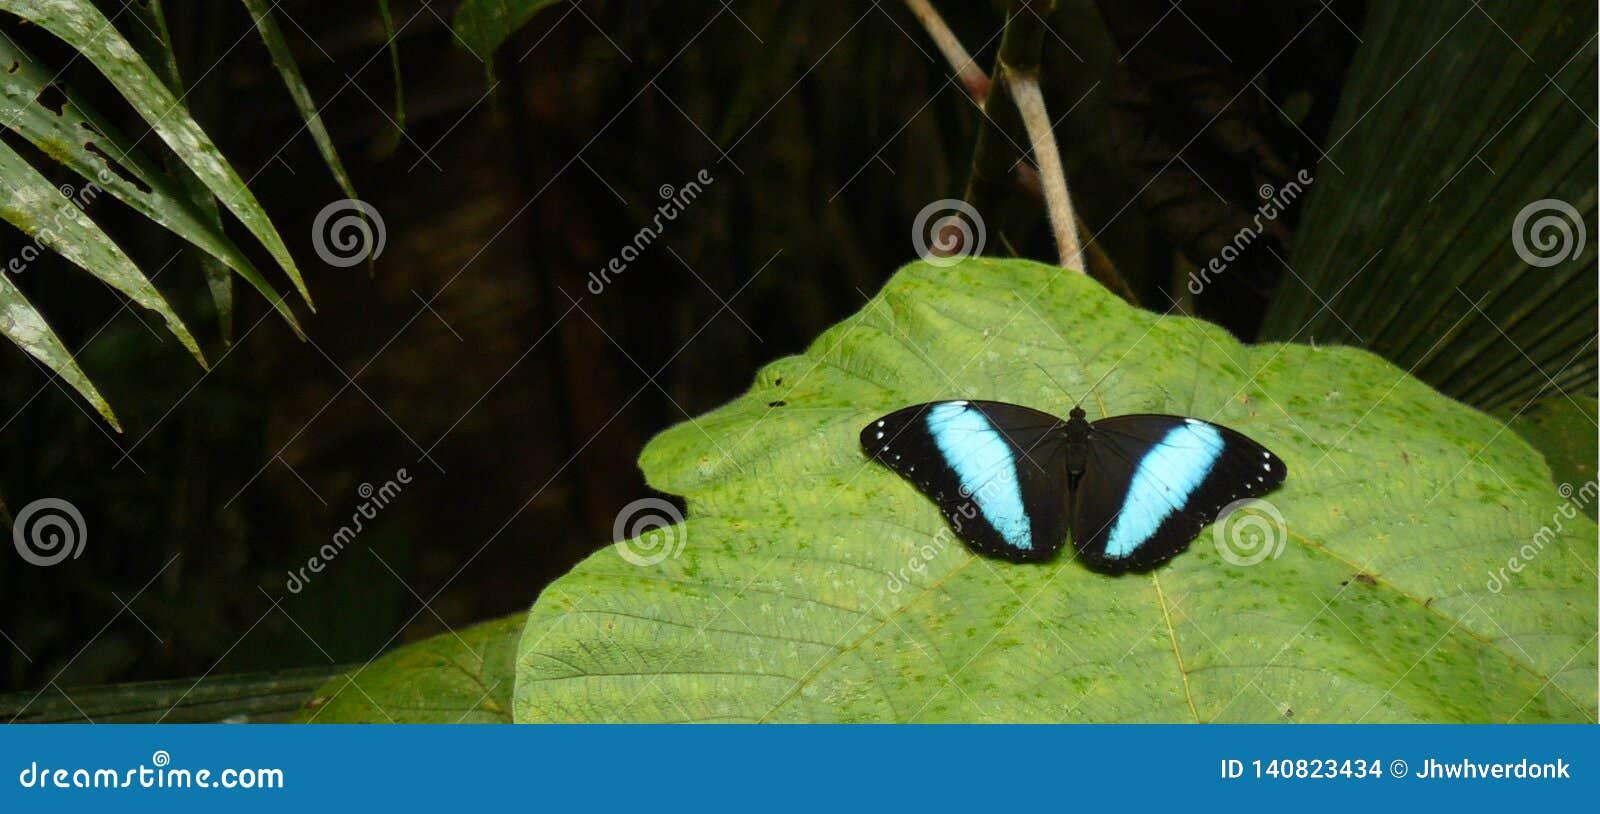 Morpho peleides ή μπλε morpho, ο πολύ μεγάλος Μαύρος με την μπλε πεταλούδα που βρίσκεται στο Αμαζόνιο